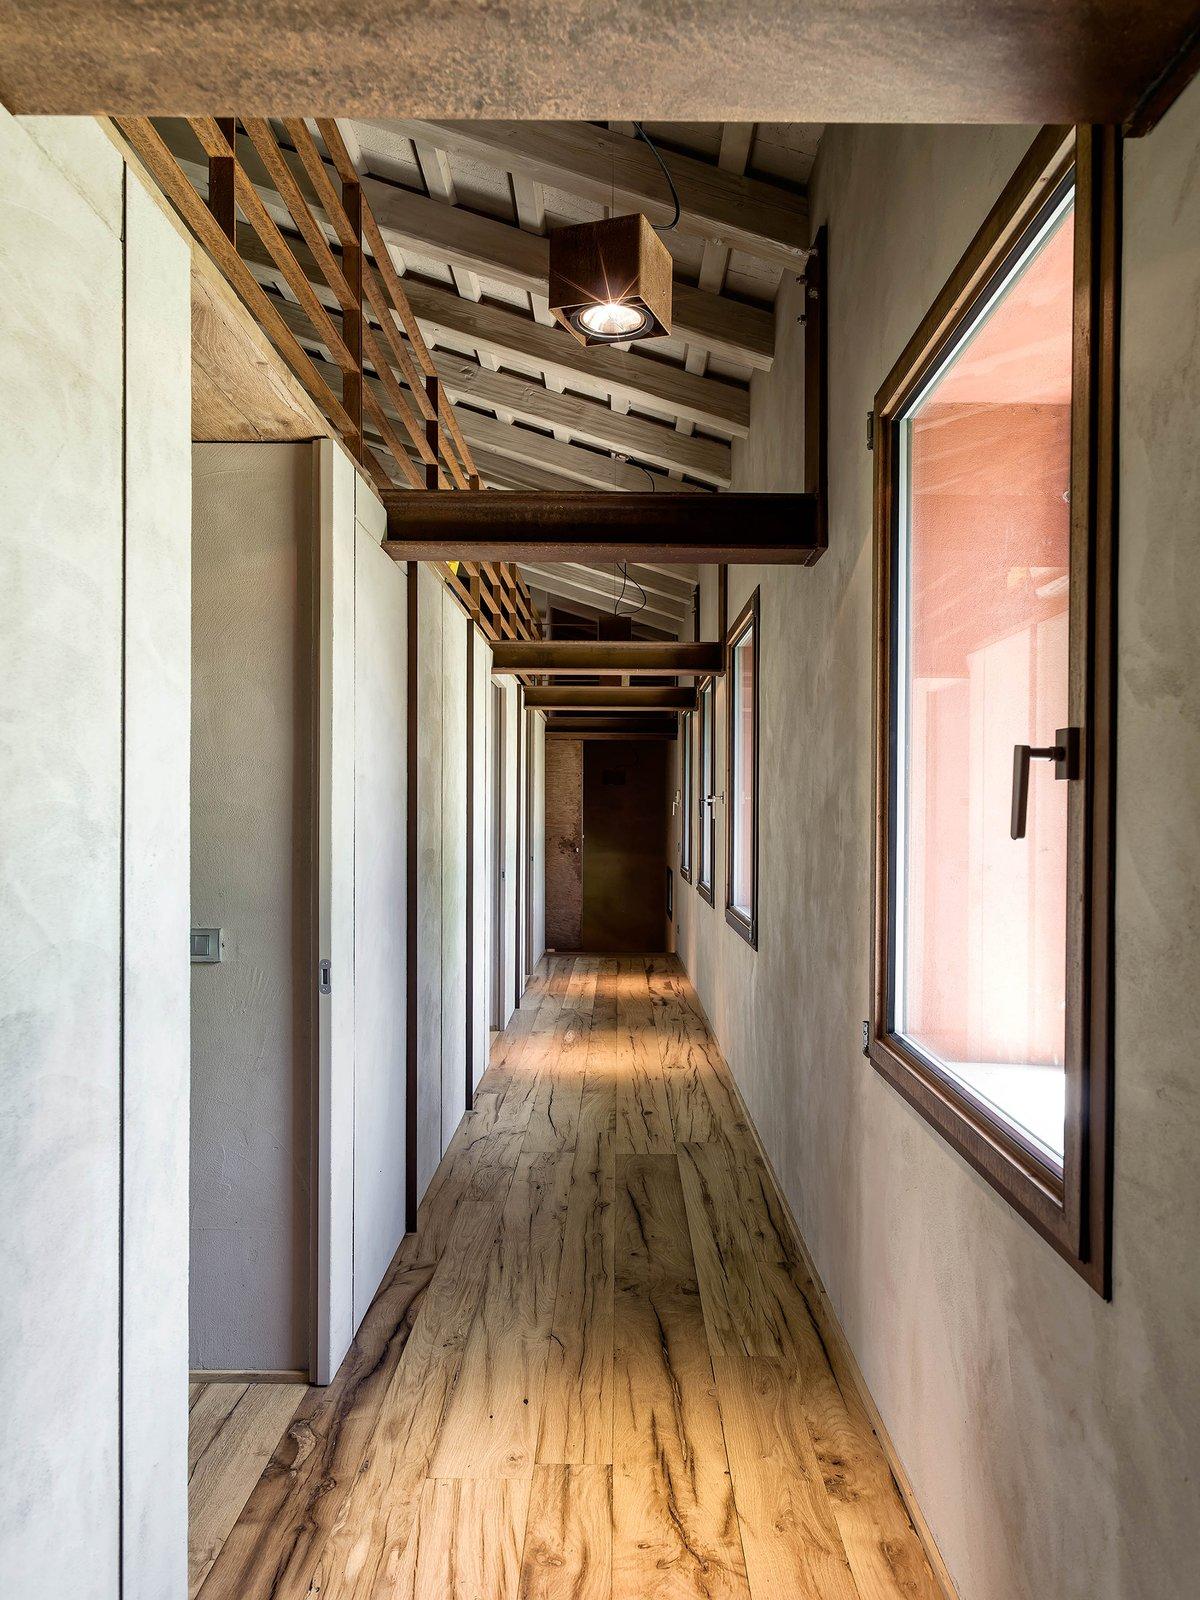 Hallway and Medium Hardwood Floor  Country House by zanon architetti associati